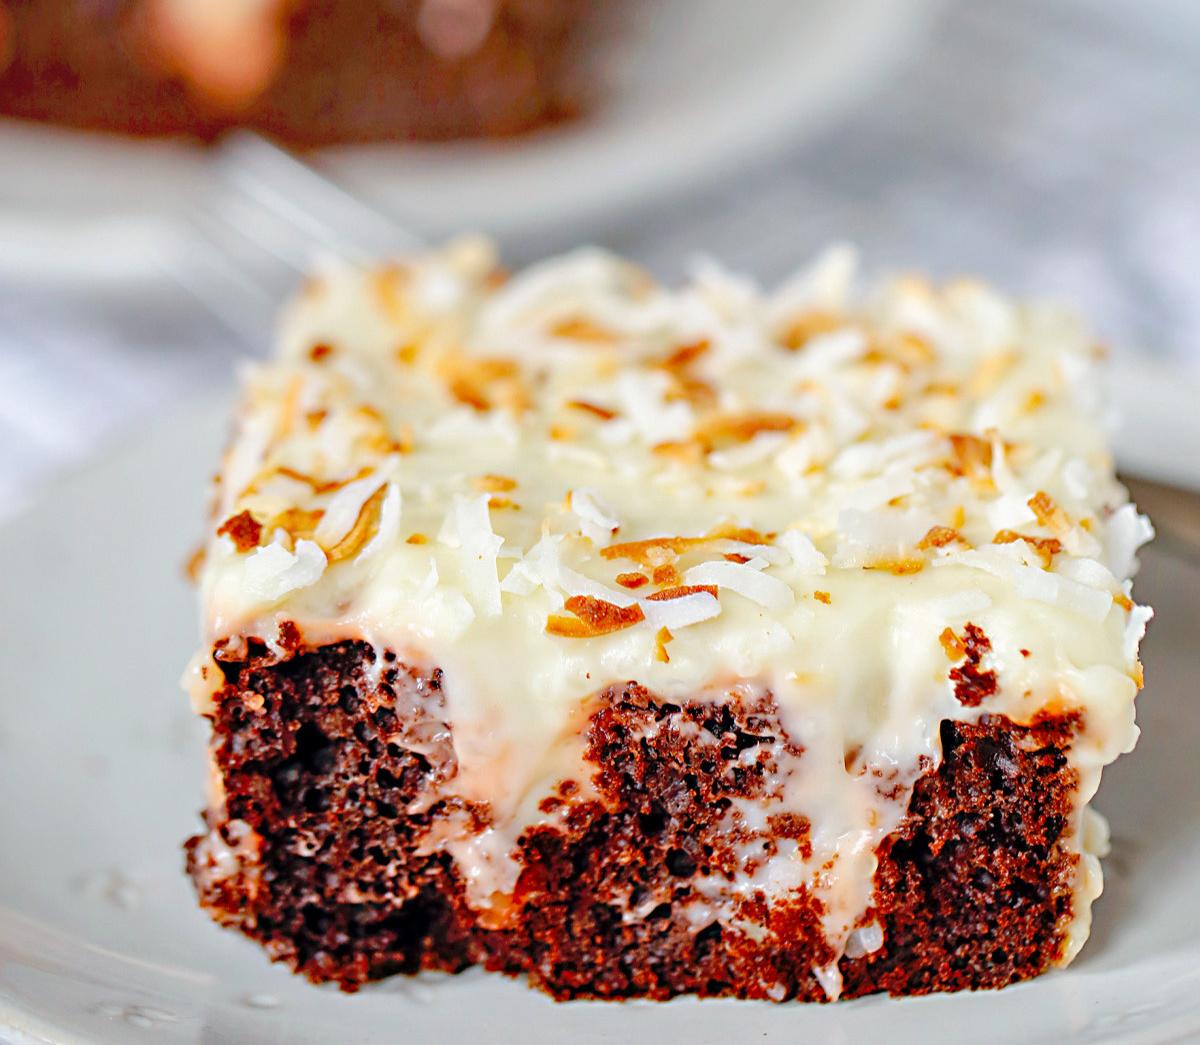 Semi-Homemade Chocolate Coconut Poke Cake